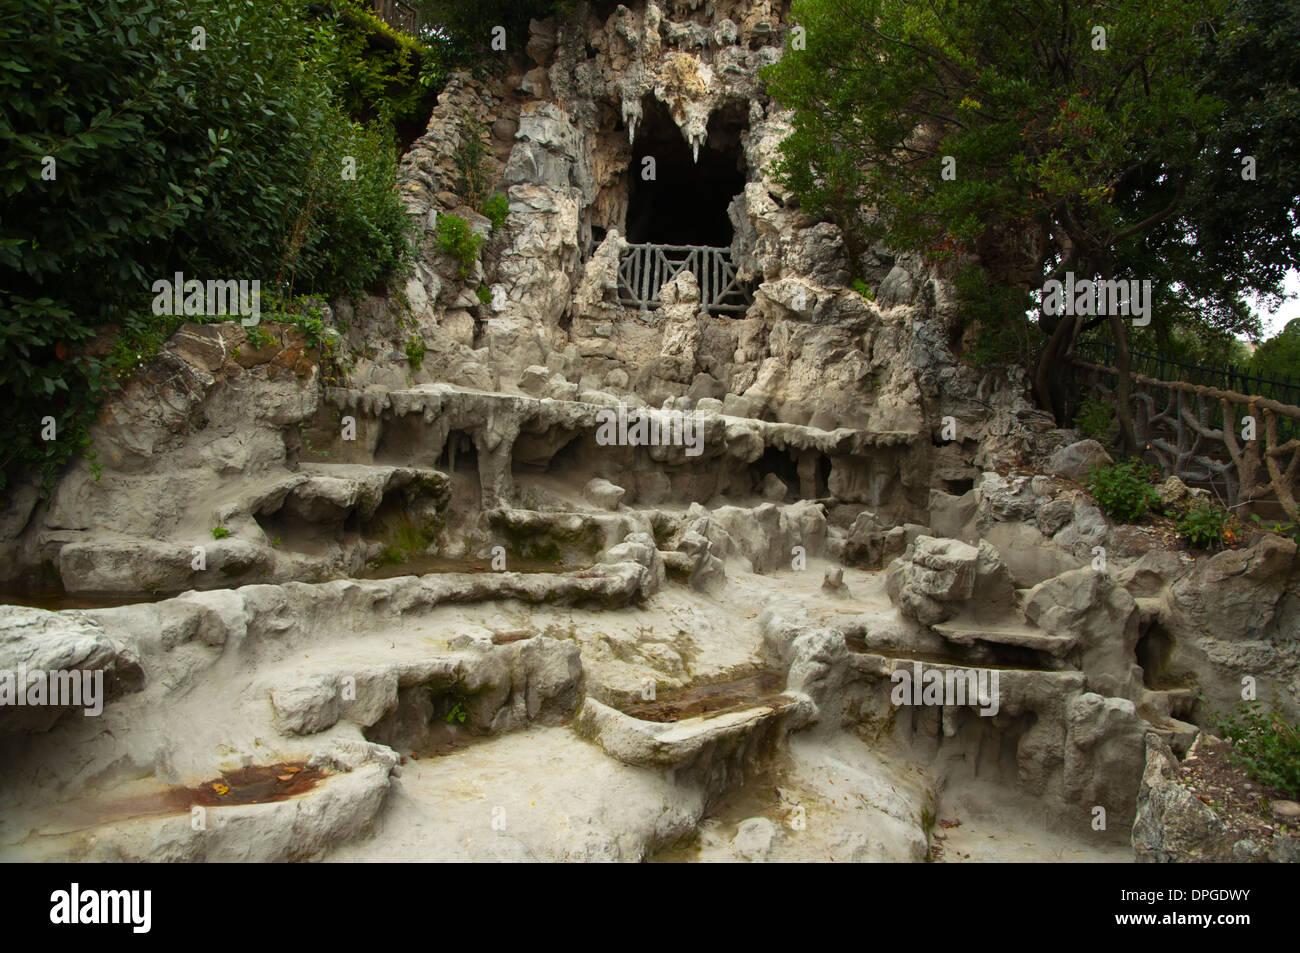 Waterfalls and grottoes Villetta di Negro park central Genoa Liguria region Italy Europe - Stock Image